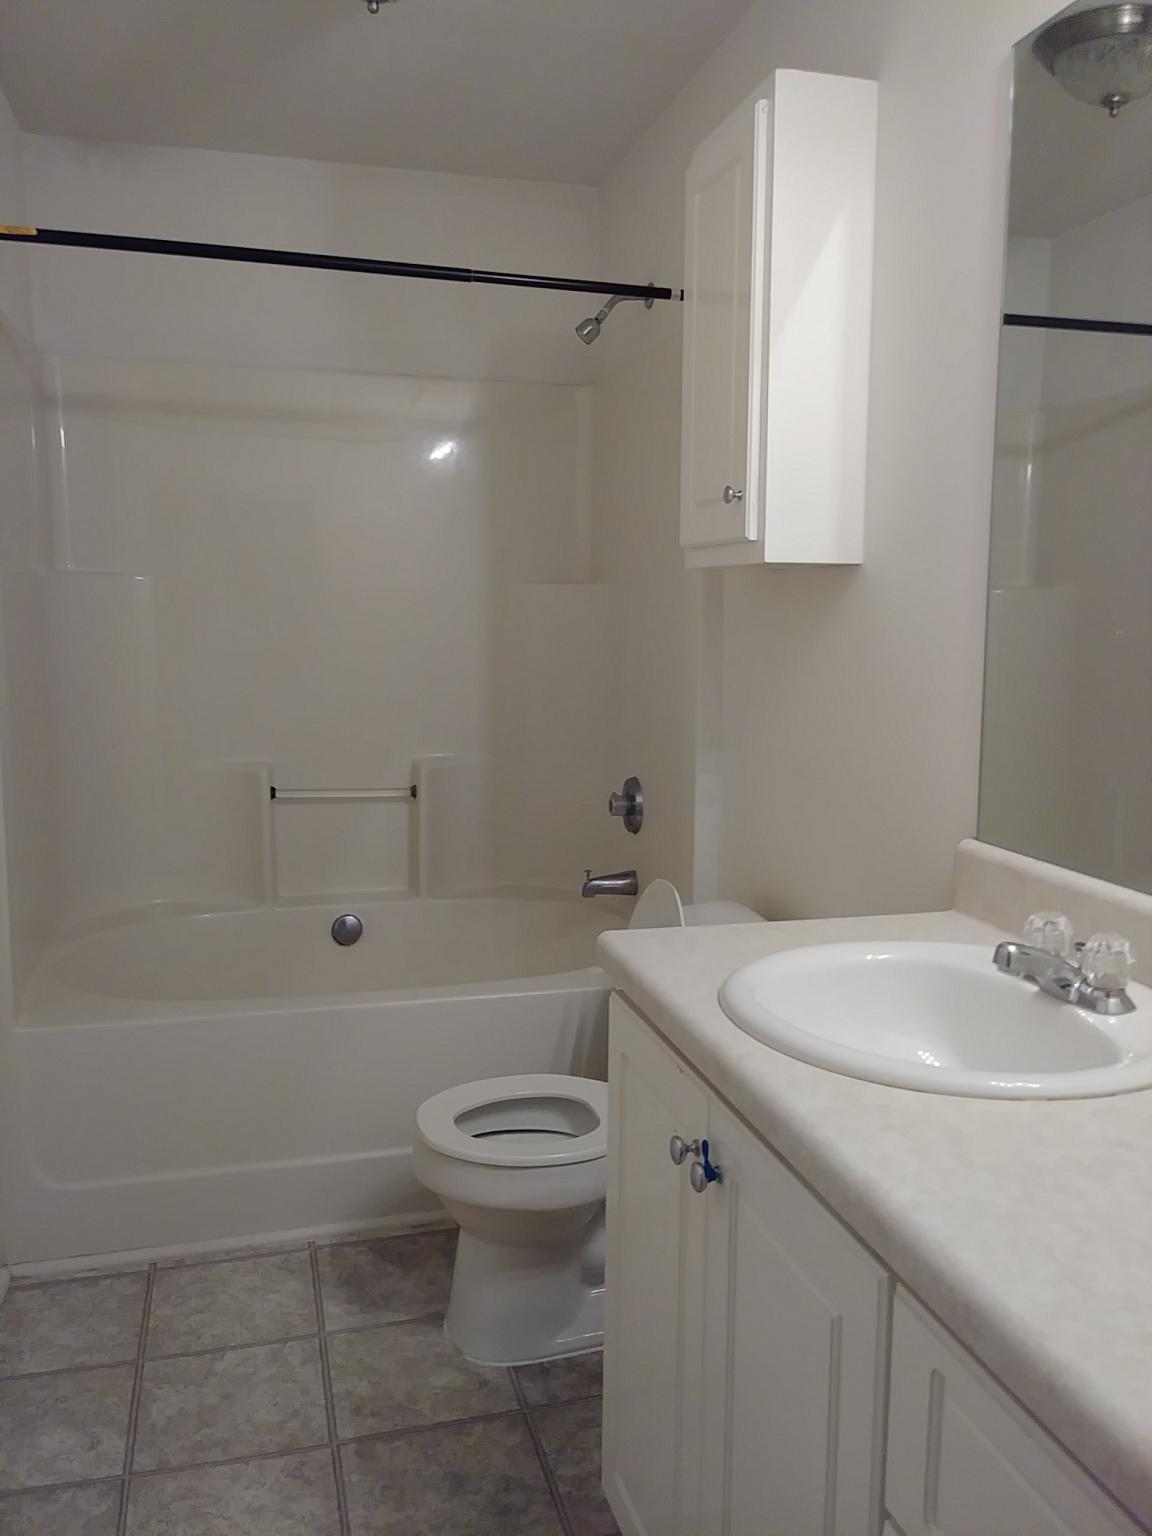 Elders Pond Cir For Rent Columbia SC Trulia - Bathroom fixtures columbia sc